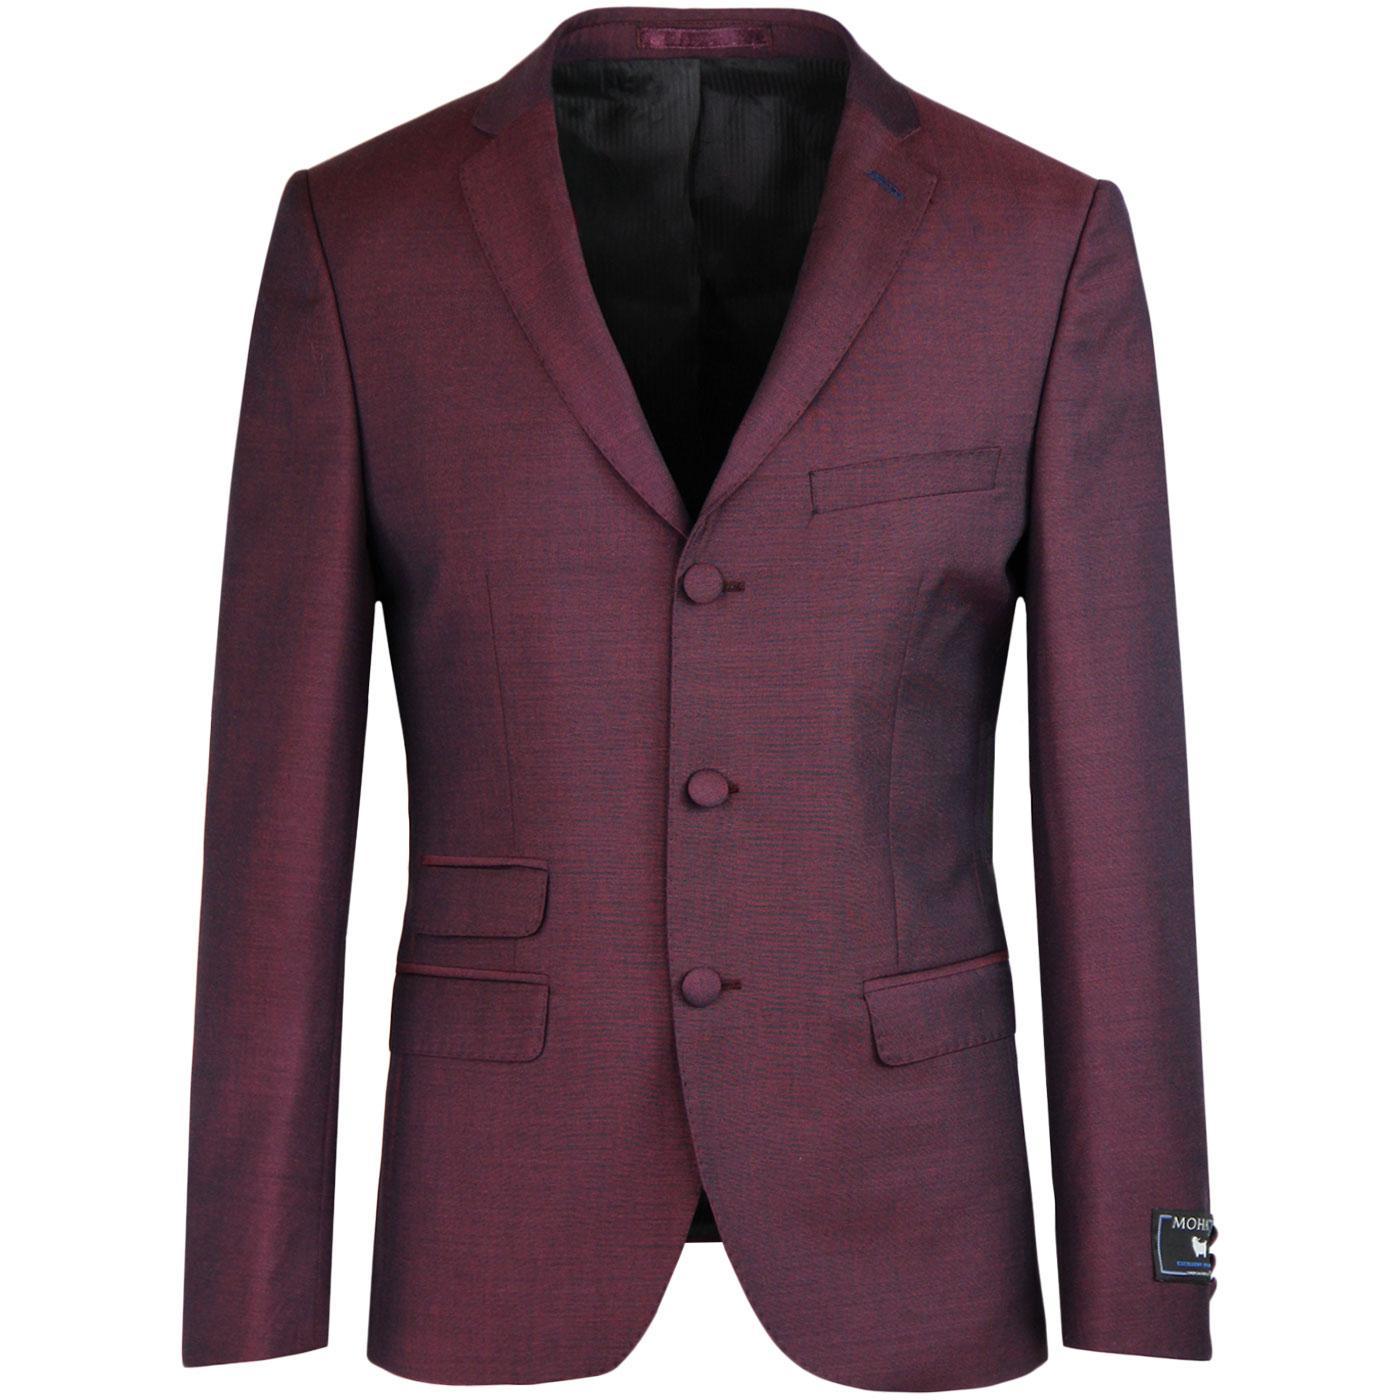 MADCAP ENGLAND Mod Mohair Tonic Suit Jacket (Burg)